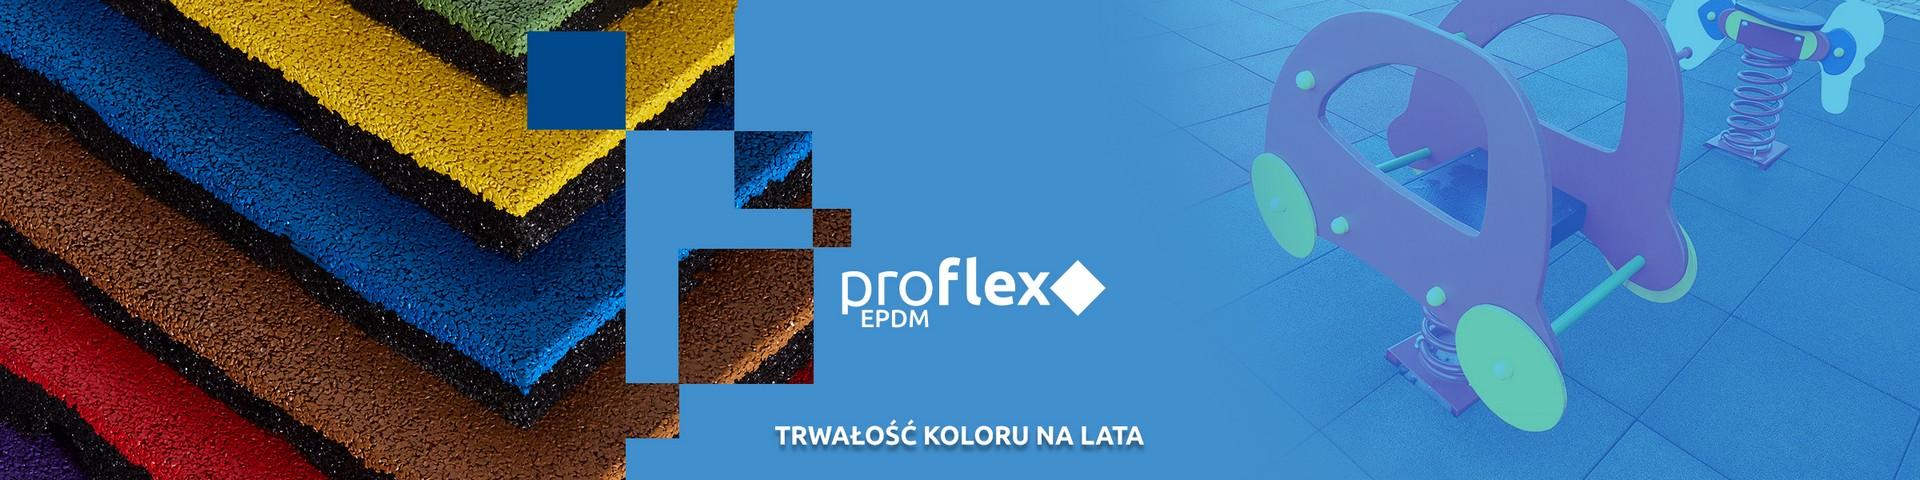 PROFLEX EPDM